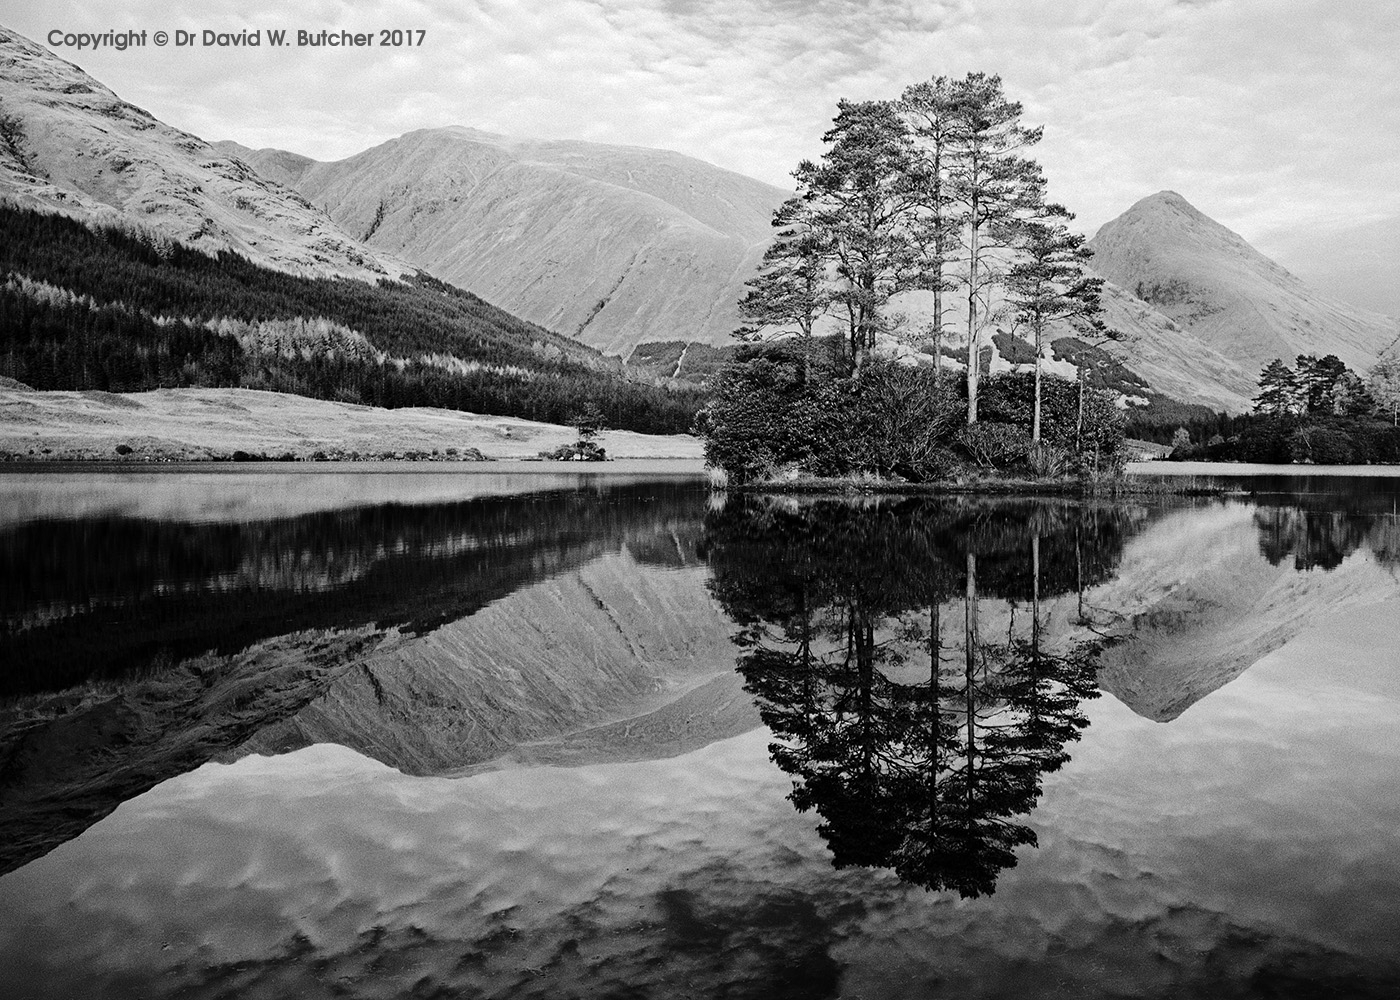 Lochan Urr Reflections, Glen Etive, Scotland